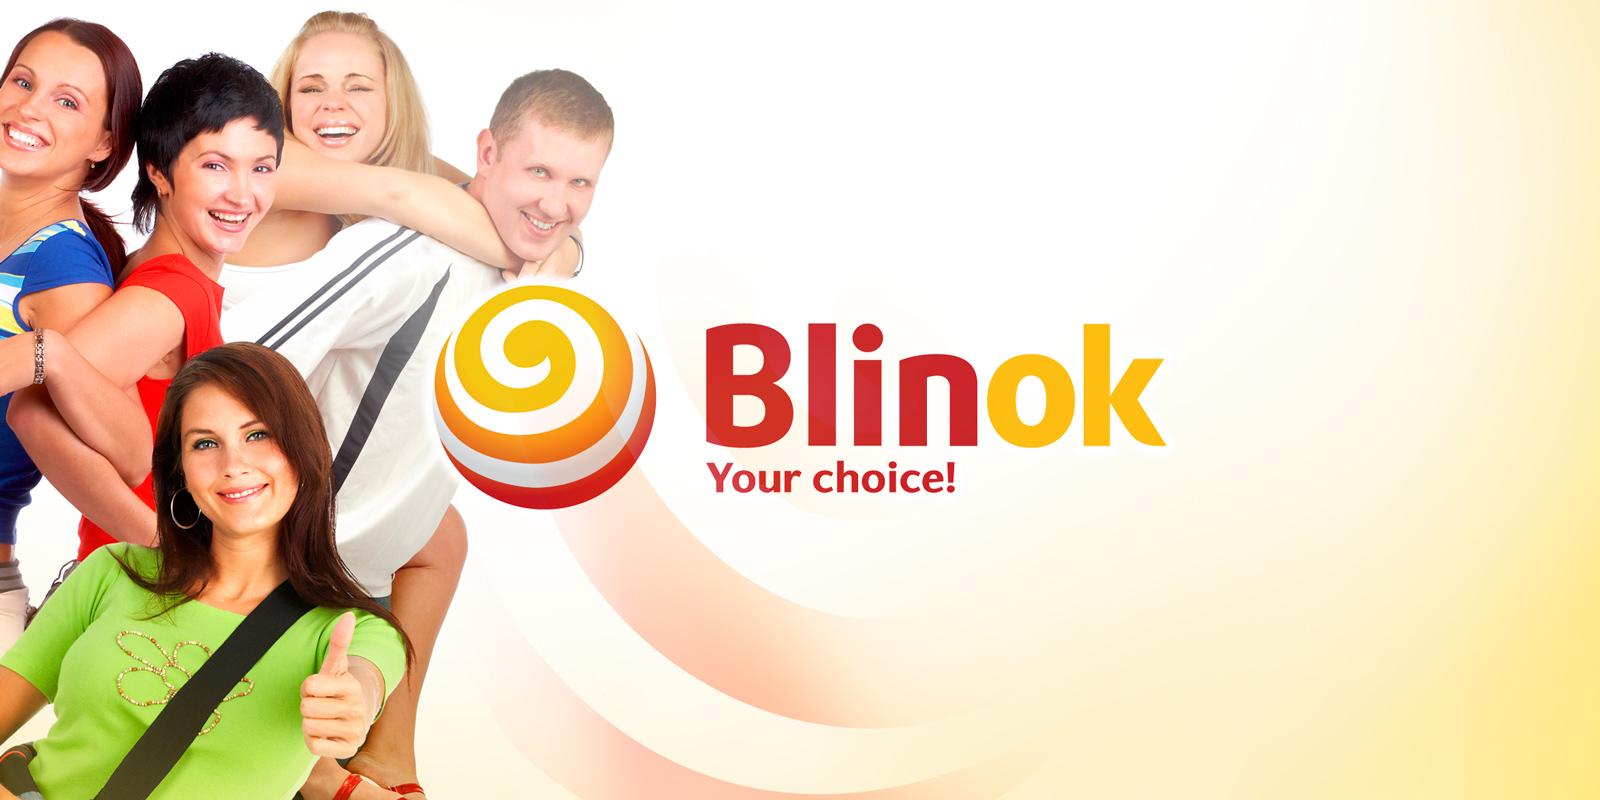 TM Blinok;;;;;;Разработка Логотипа;;;;;;<span>Клиент:</span> TM Blinok;;;;;;;;;;;;Разработка Логотипа;;;;;;1